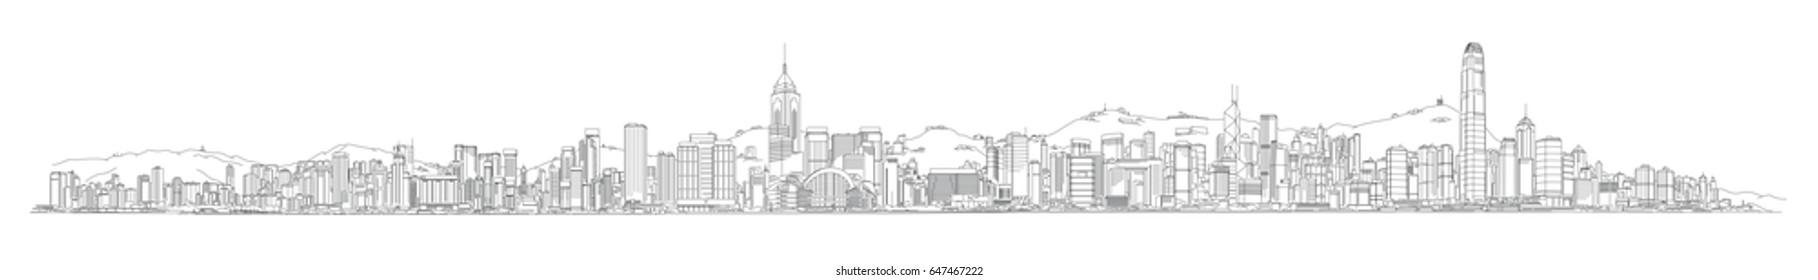 Skyline vector illustration Hong Kong